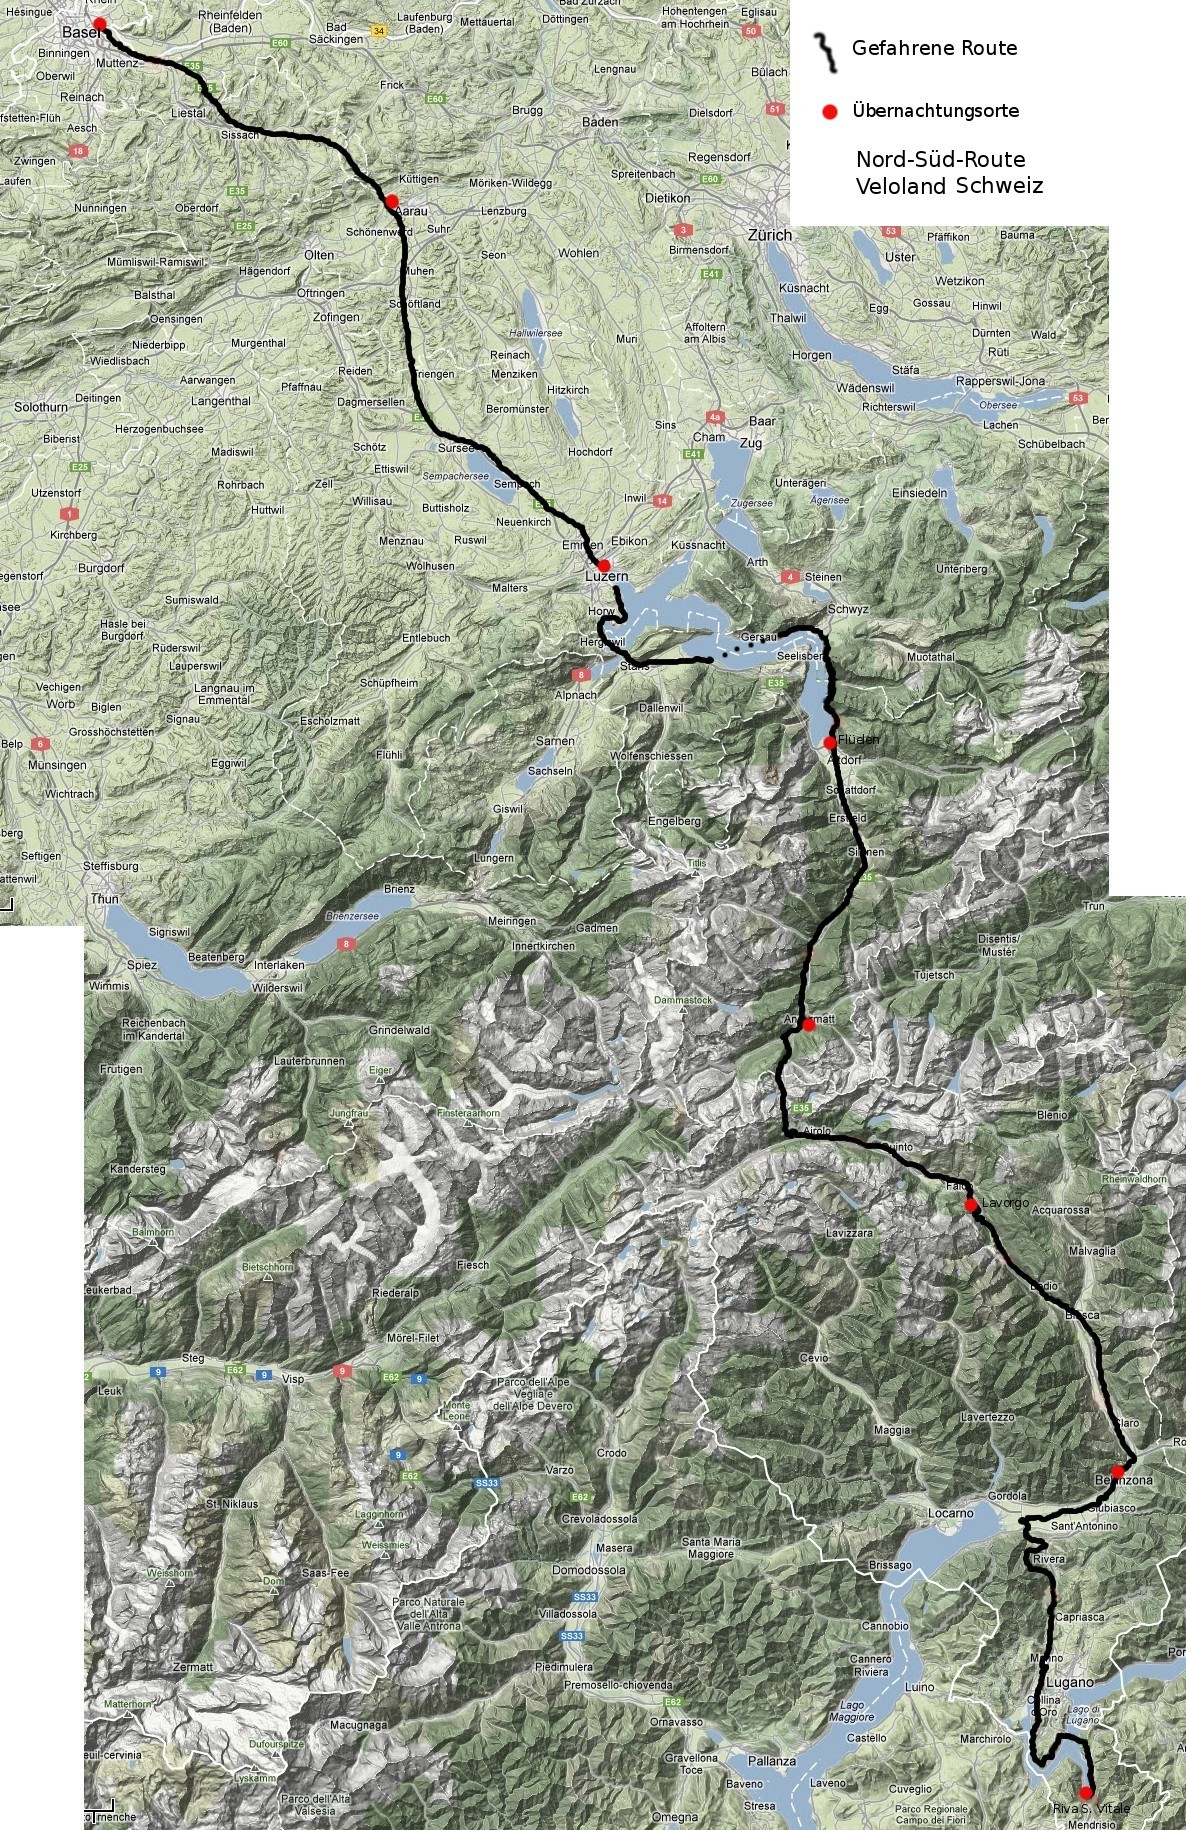 schweiz nord s d route alpen berquerung sommer 2012. Black Bedroom Furniture Sets. Home Design Ideas